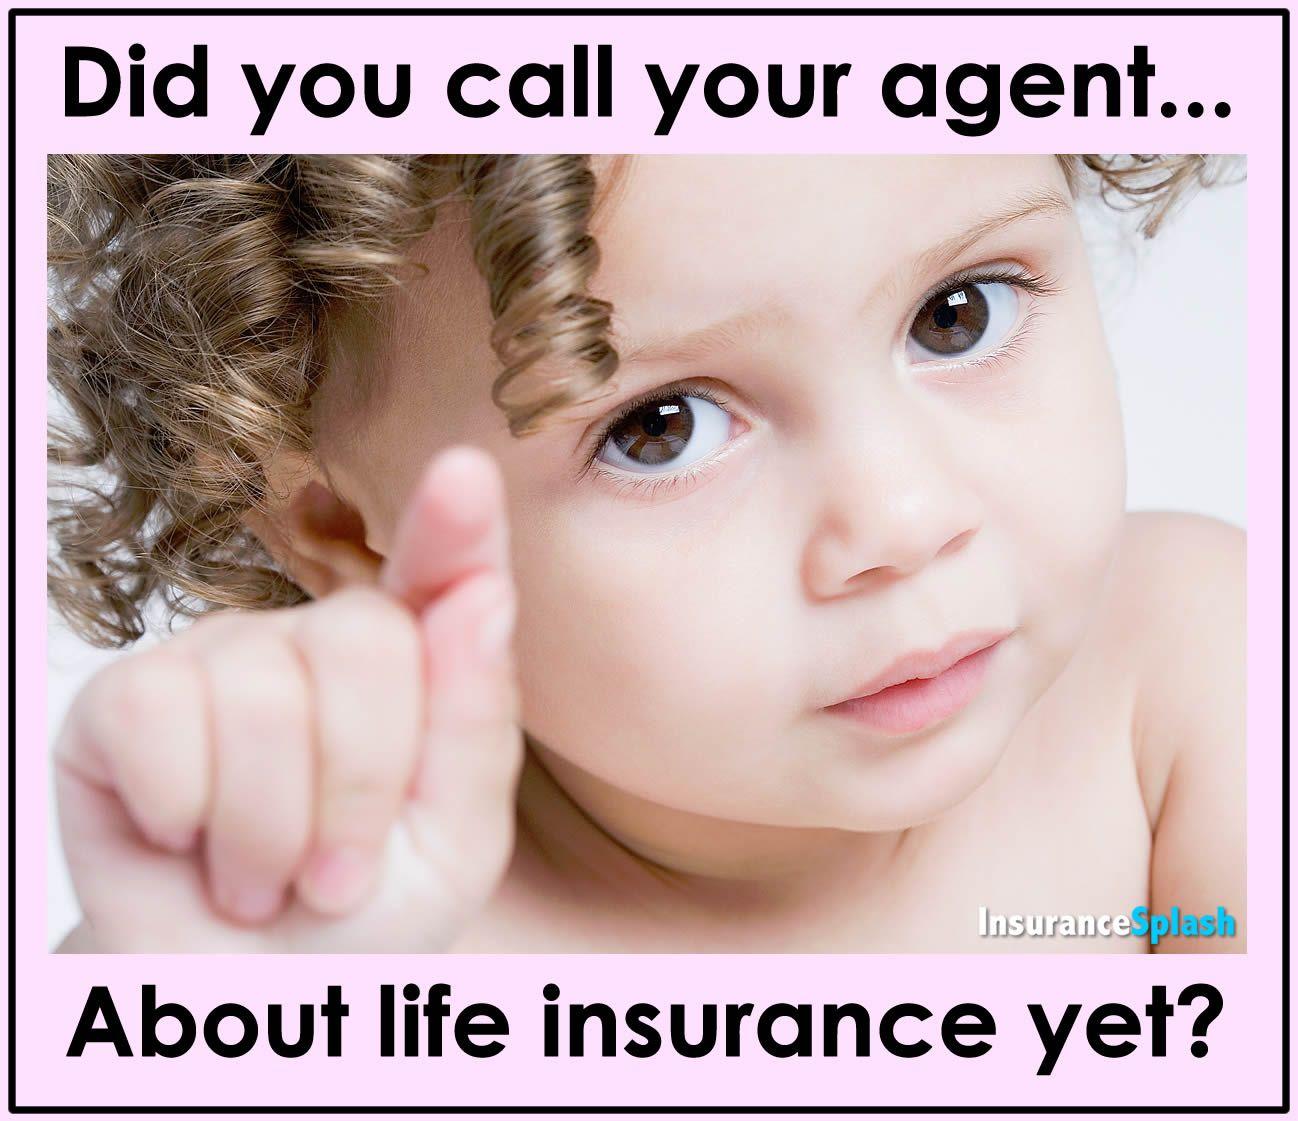 Good quesiton insurance marketing pet insurance reviews